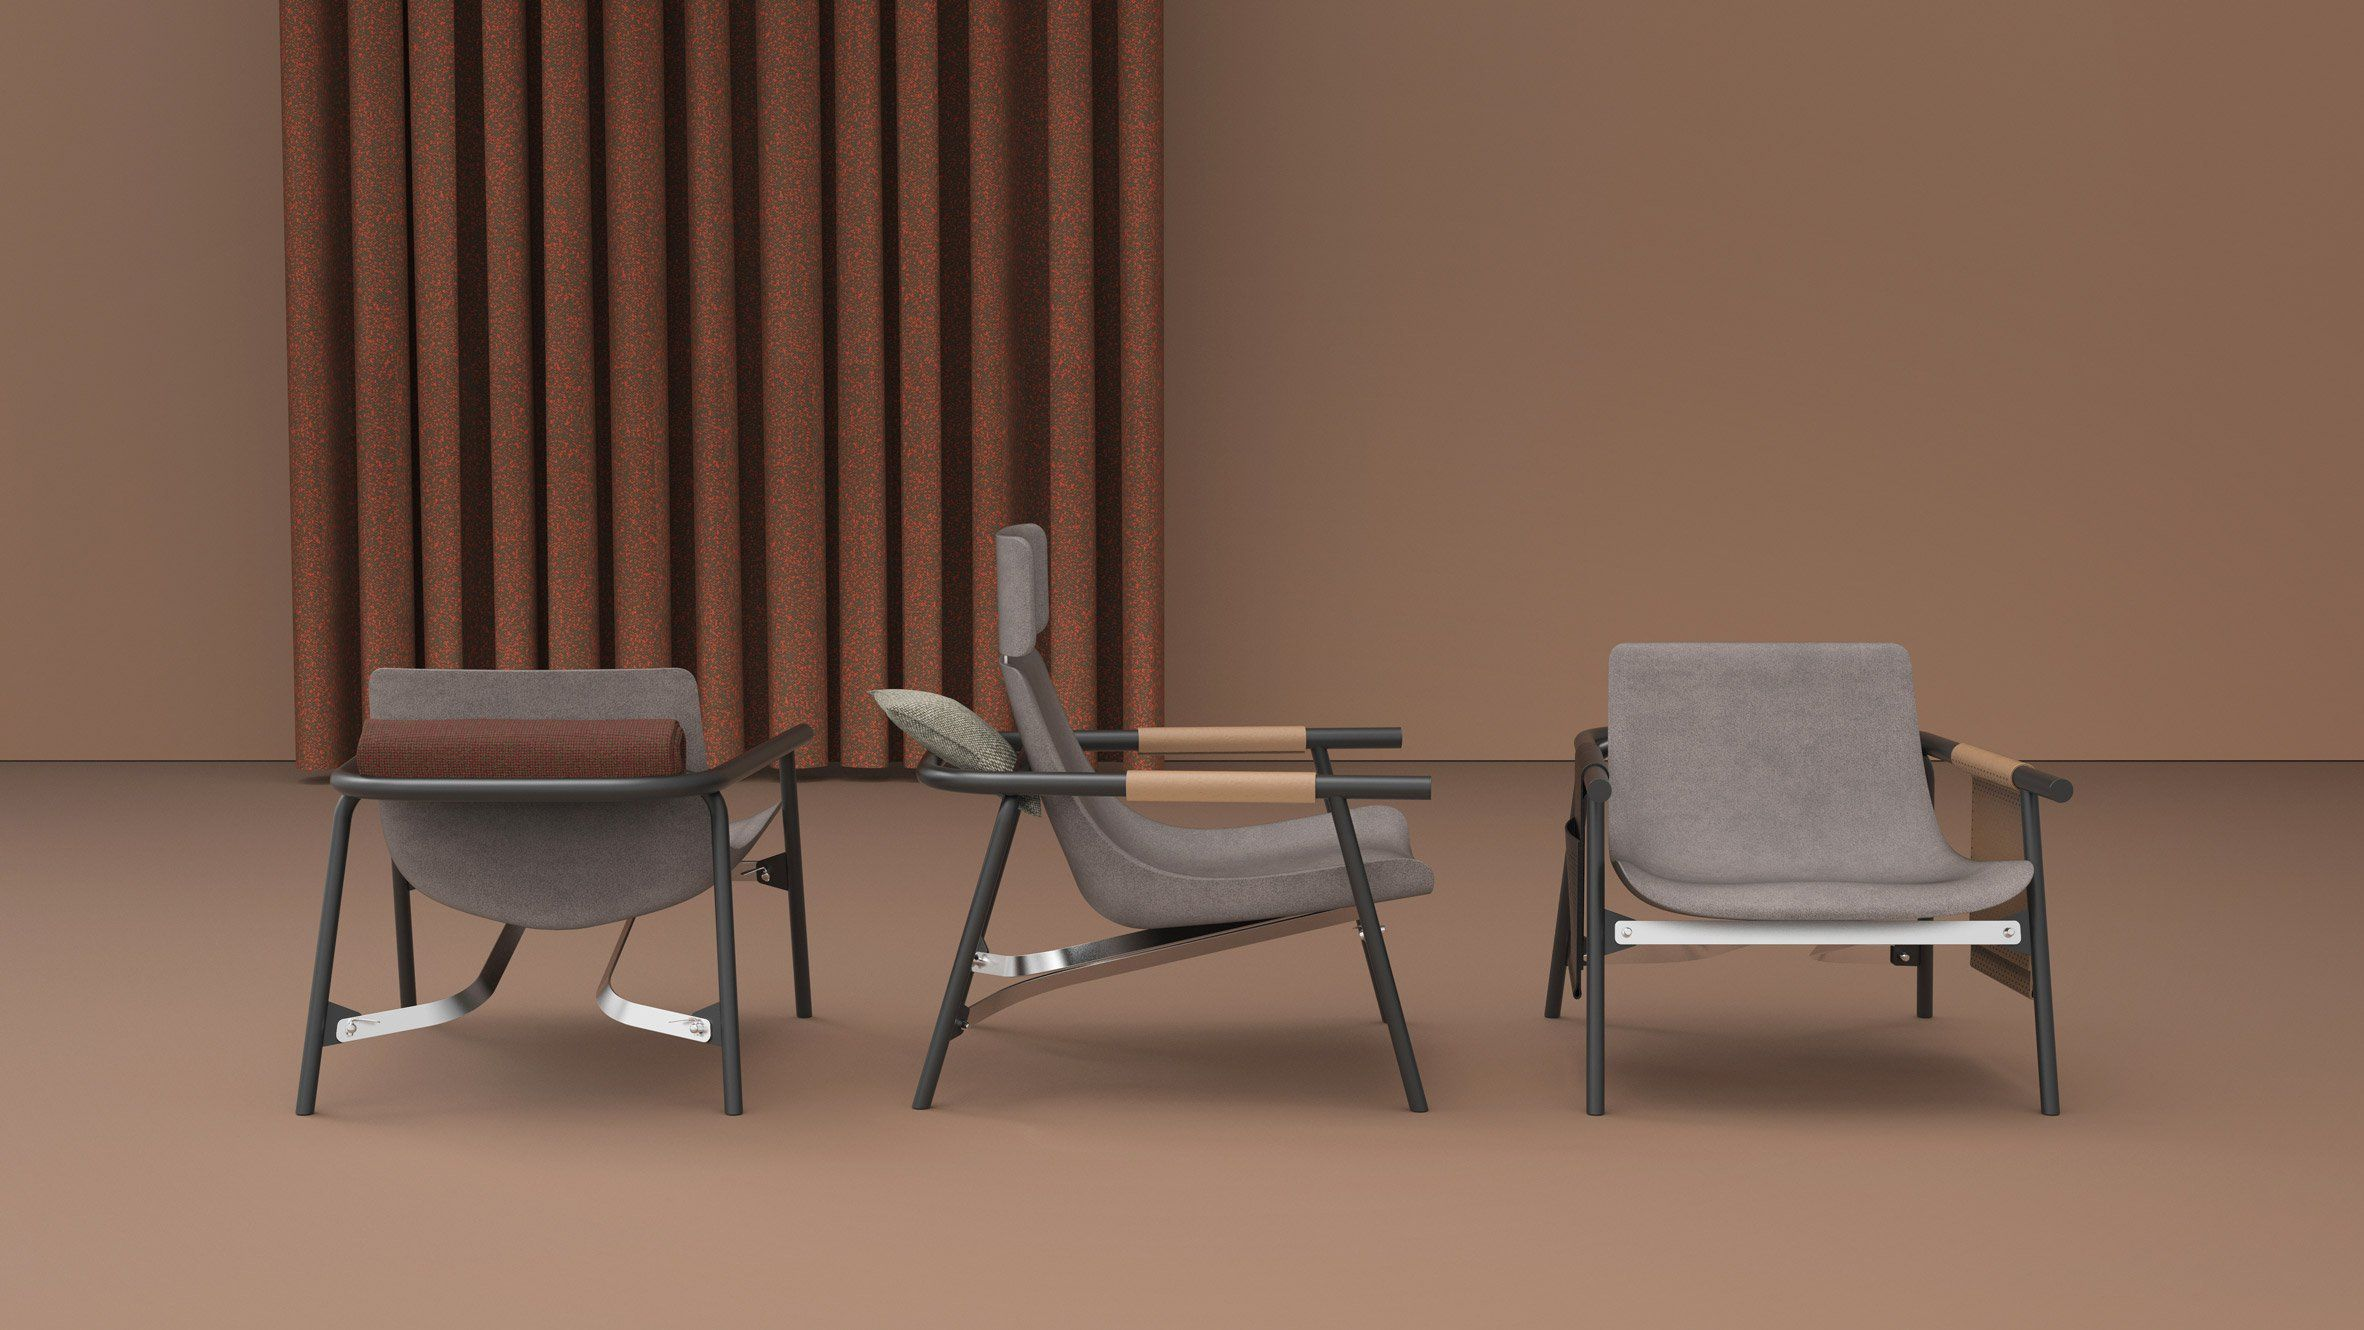 EDDY Lounge chair by Alain Gilles(이미지 포함) 의자